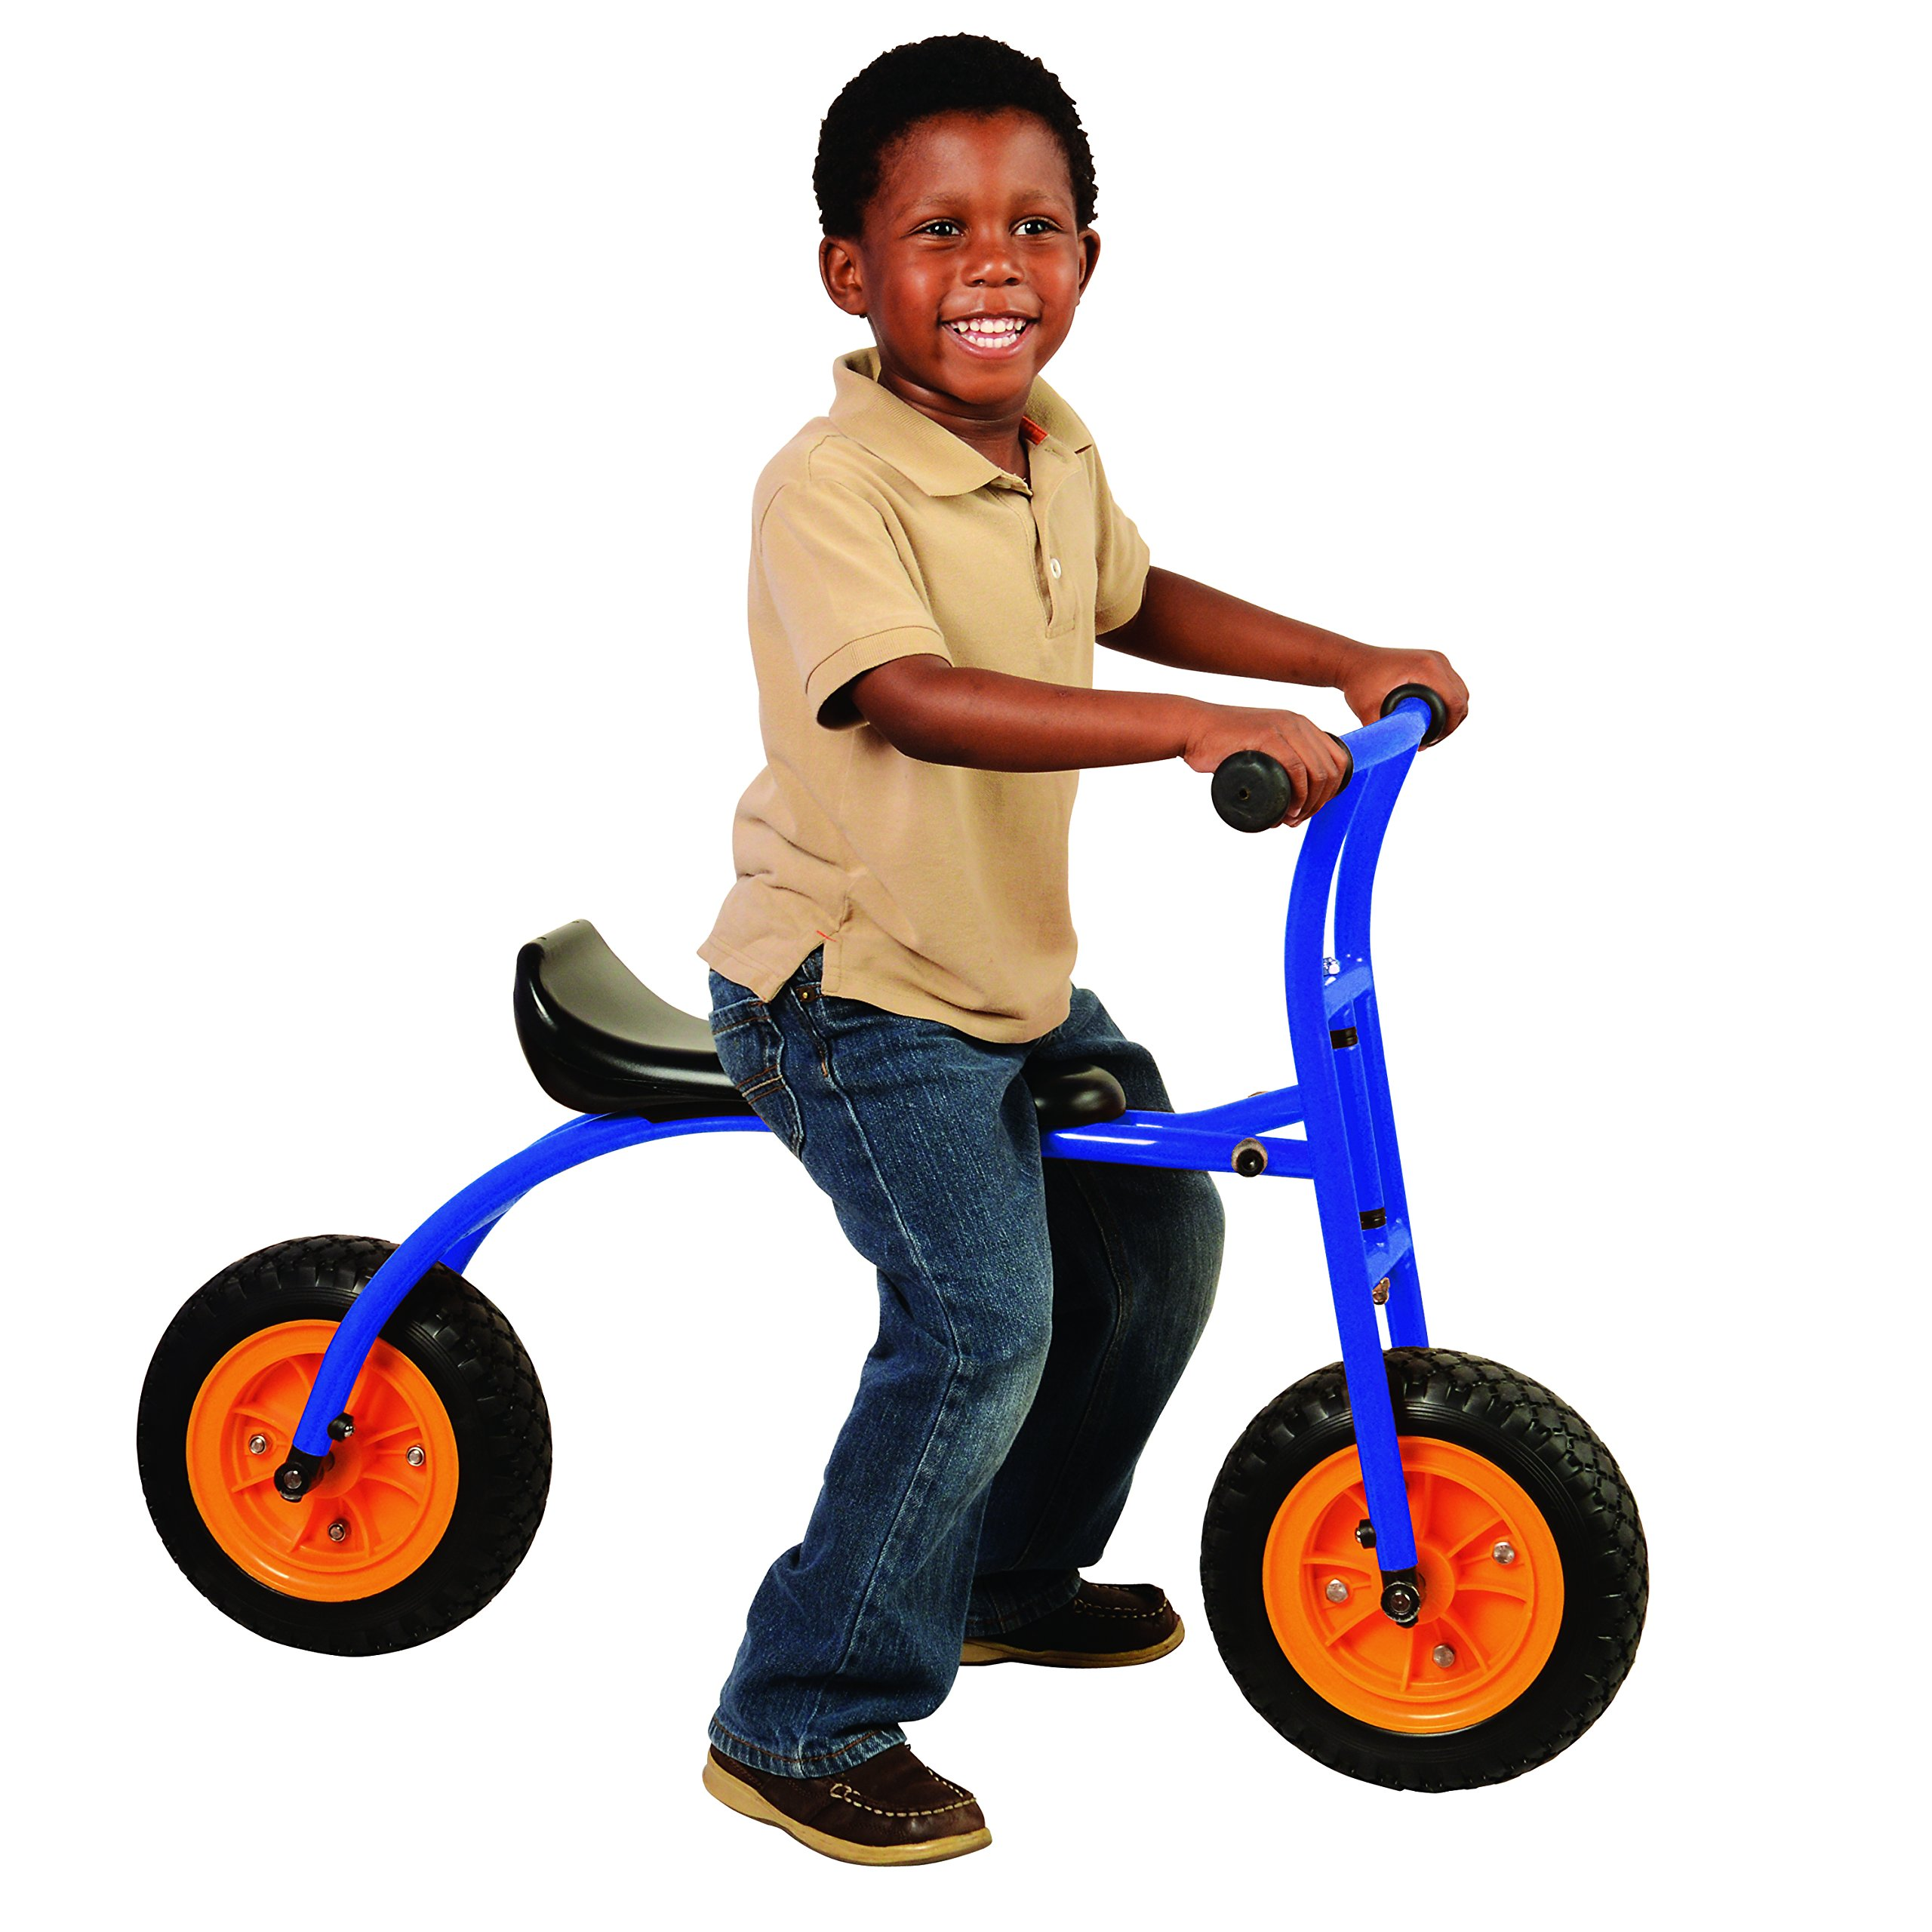 Constructive Playthings Balance Bike